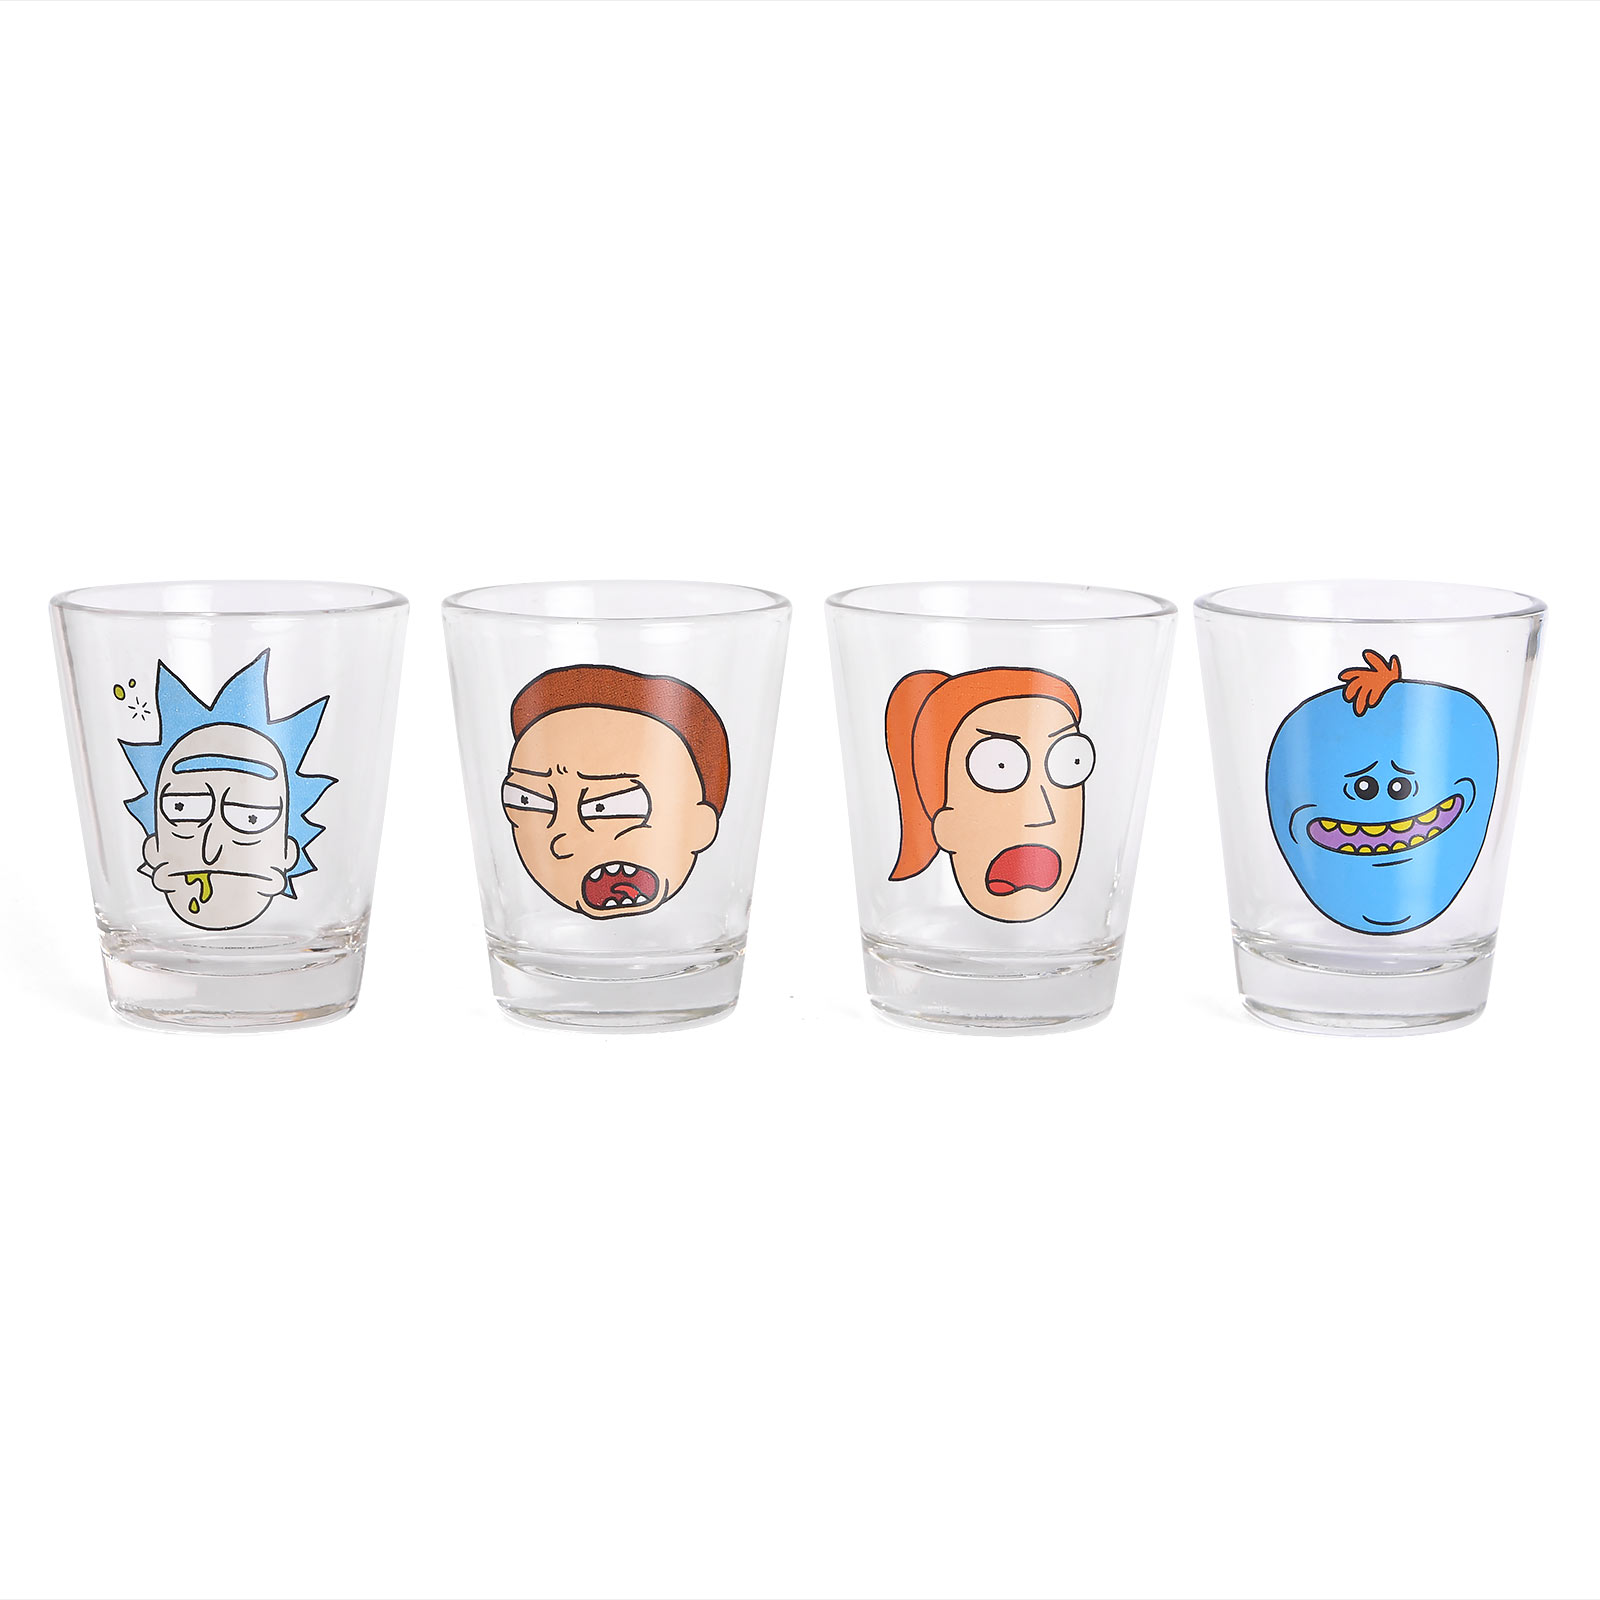 Rick and Morty - Faces Shots Gläserset